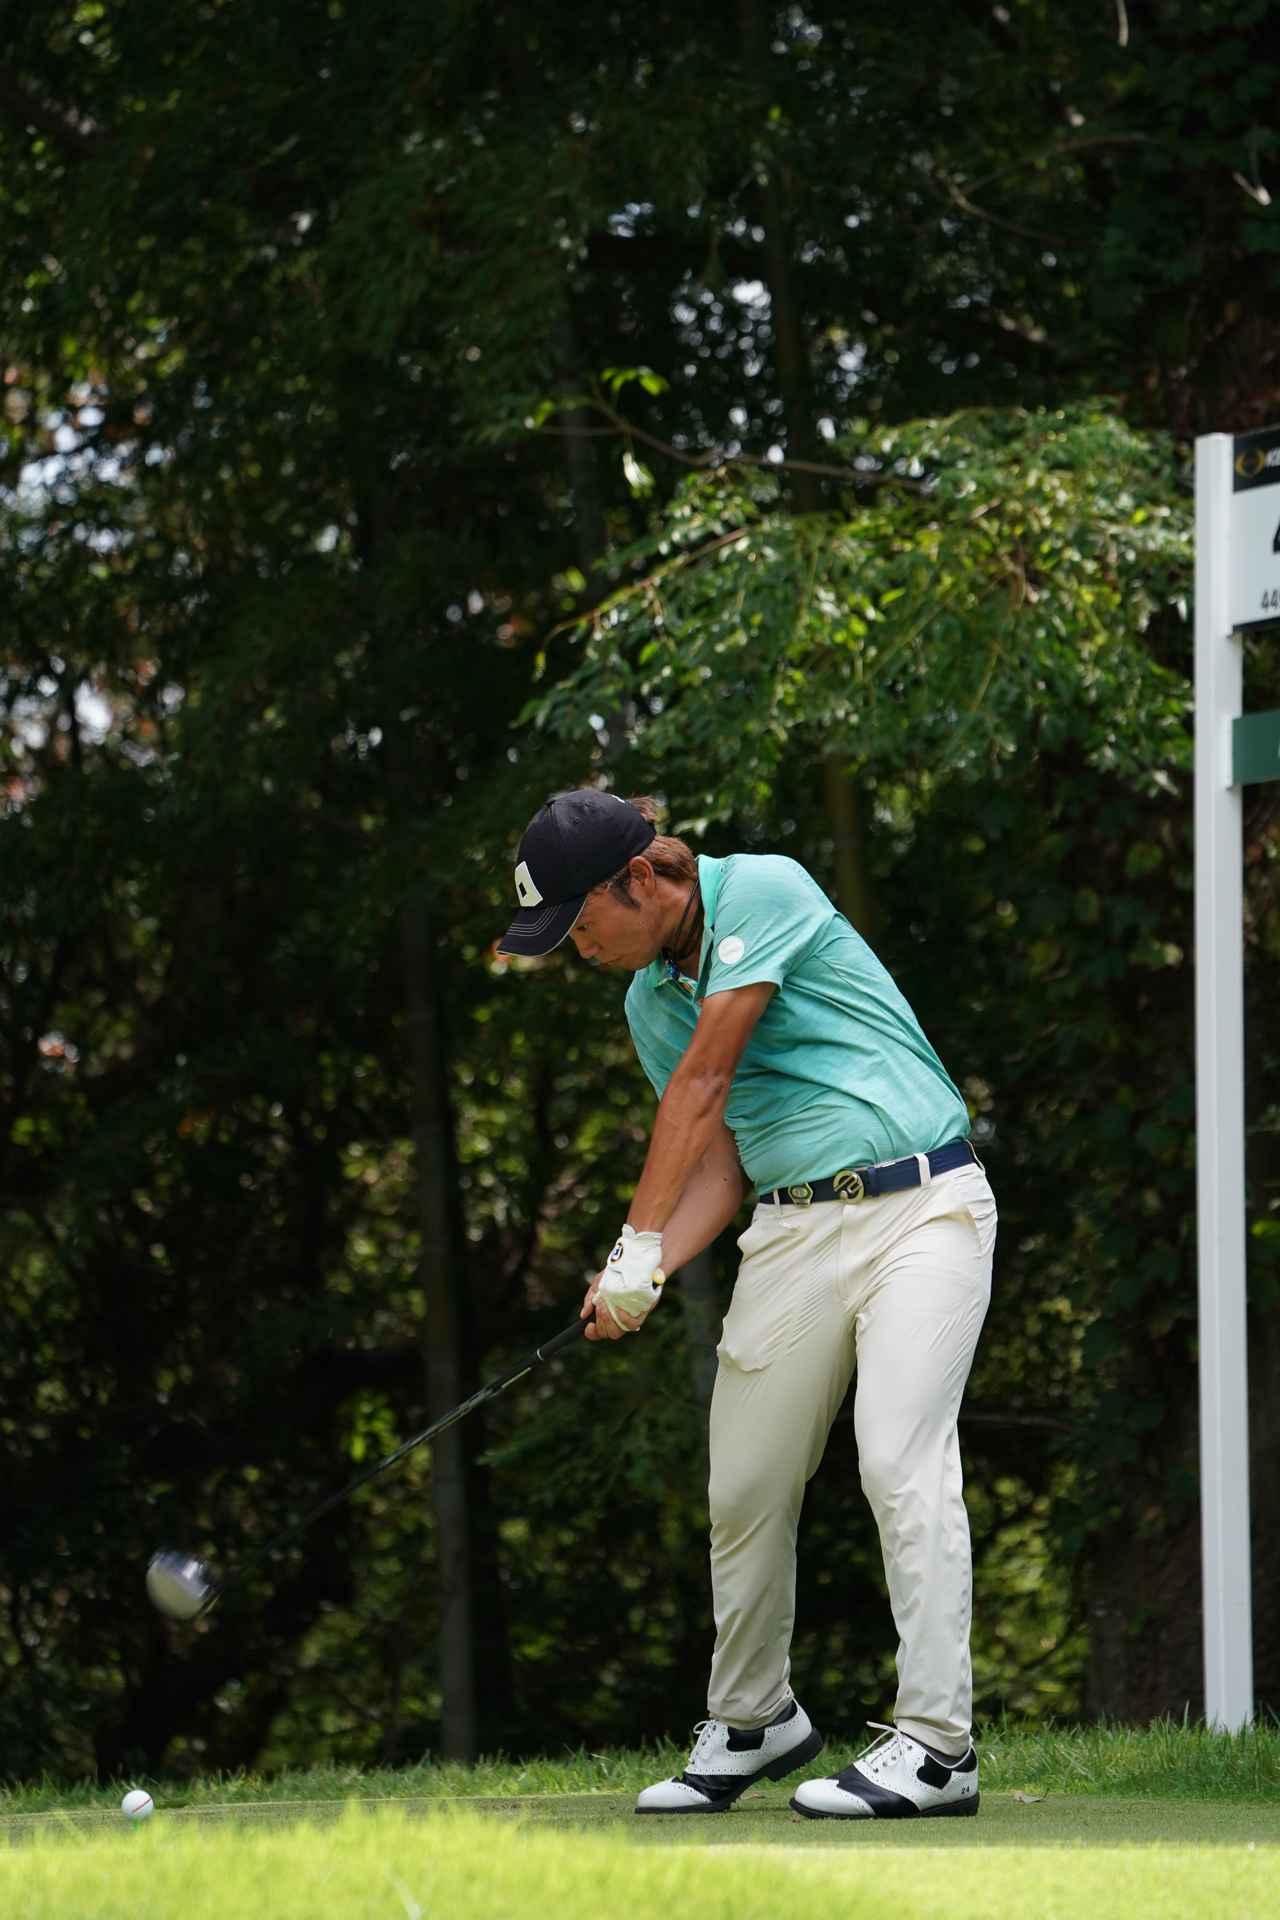 Images : 8番目の画像 - 浅地洋佑のドライバー連続写真 - みんなのゴルフダイジェスト